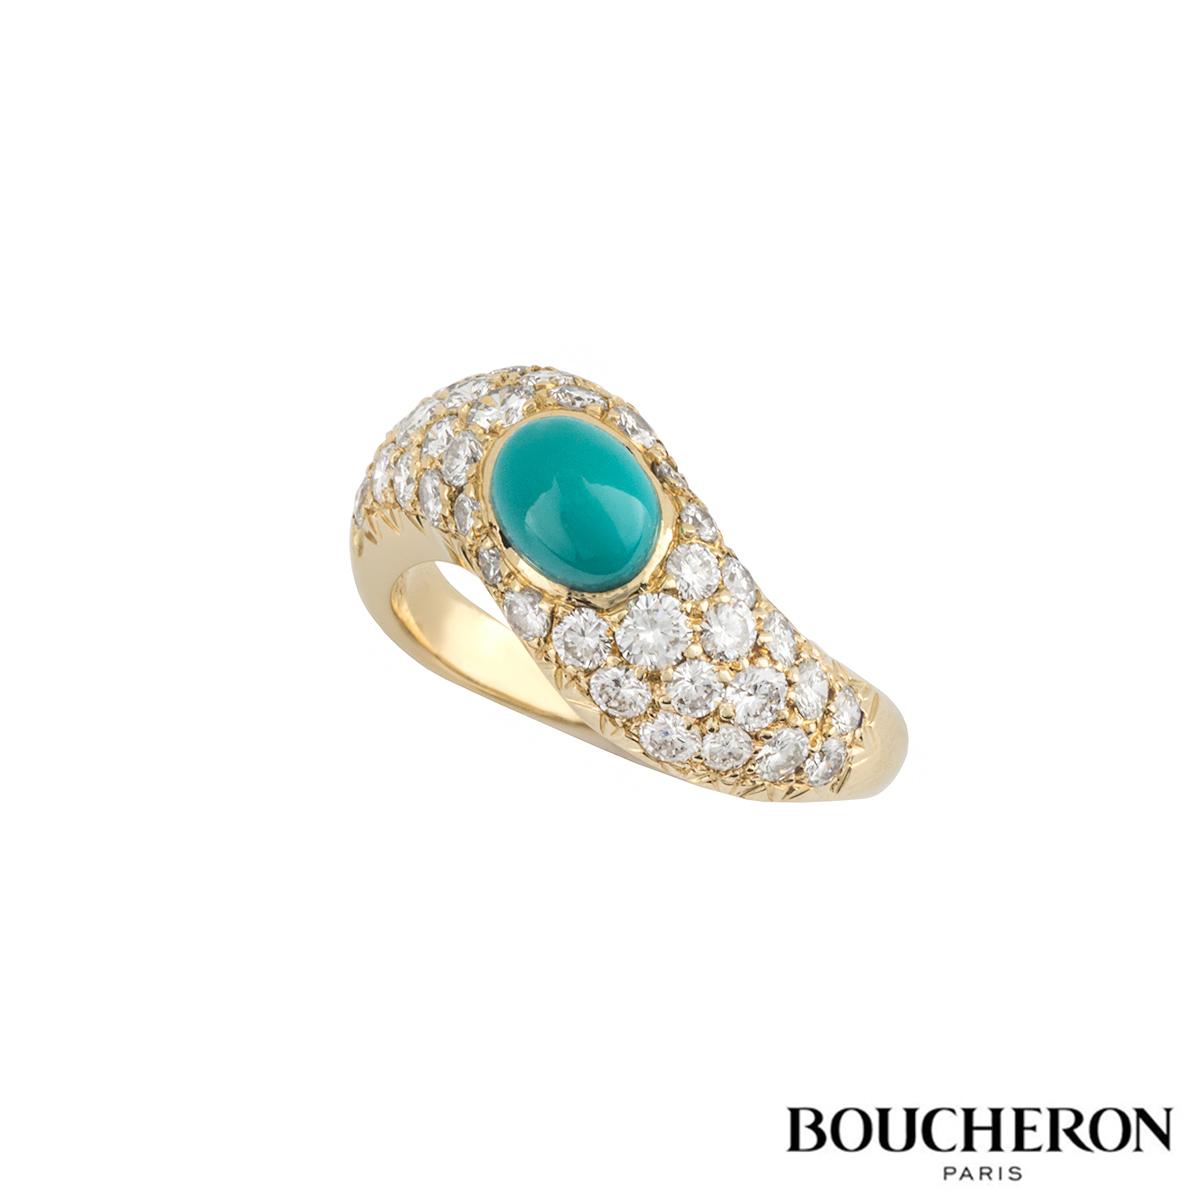 Boucheron 18k Yellow Gold Turquoise & Diamond Dress Ring